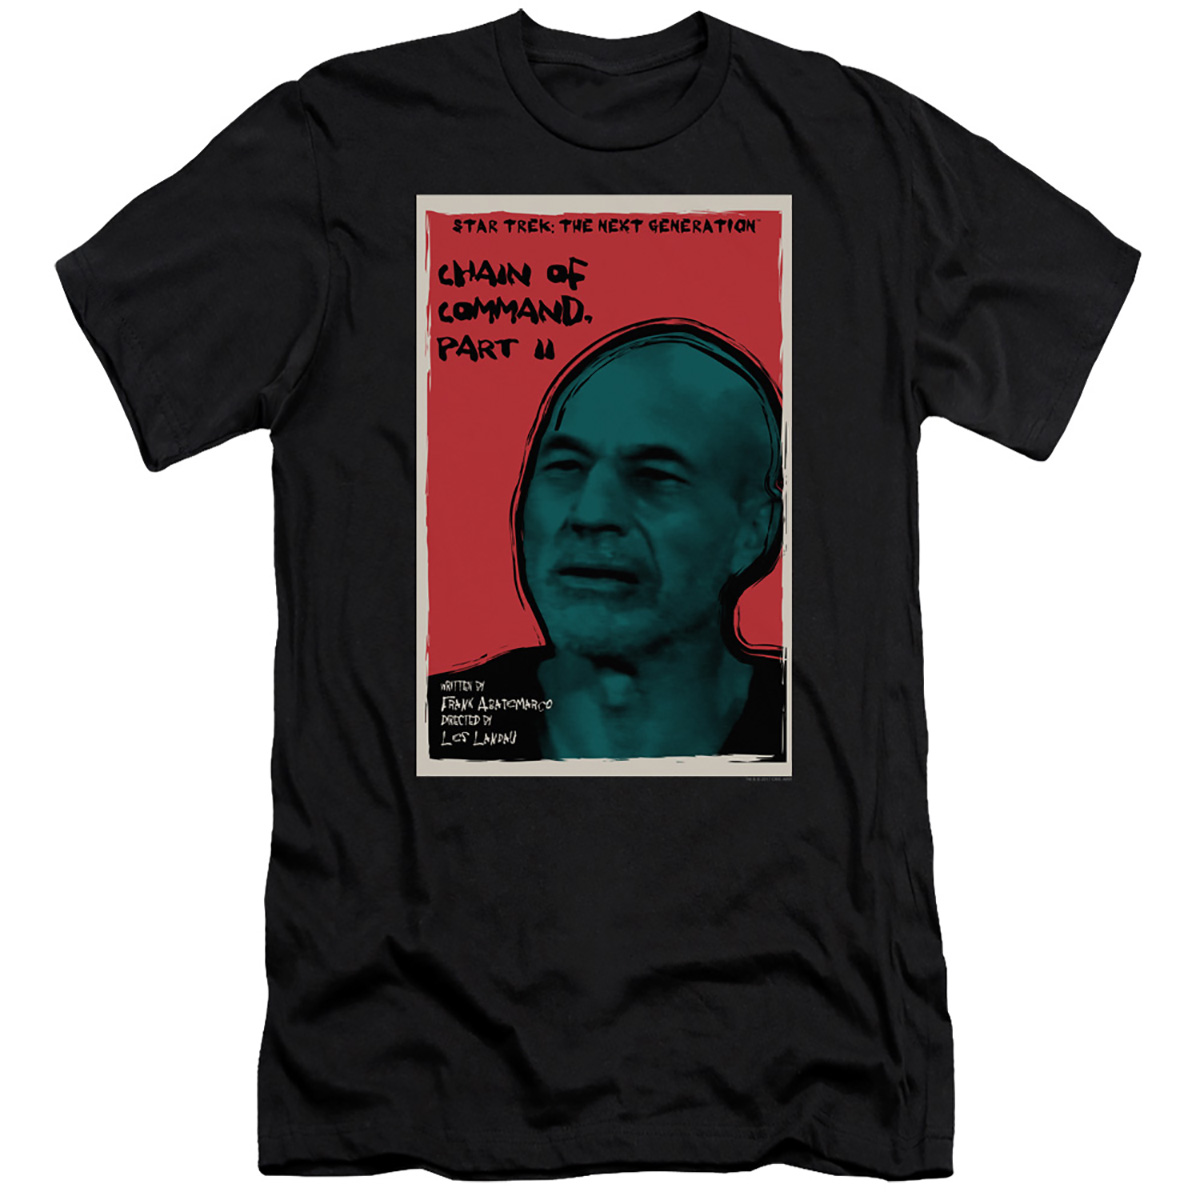 Star Trek The Next Generation Chain of Command, Part II T-Shirt